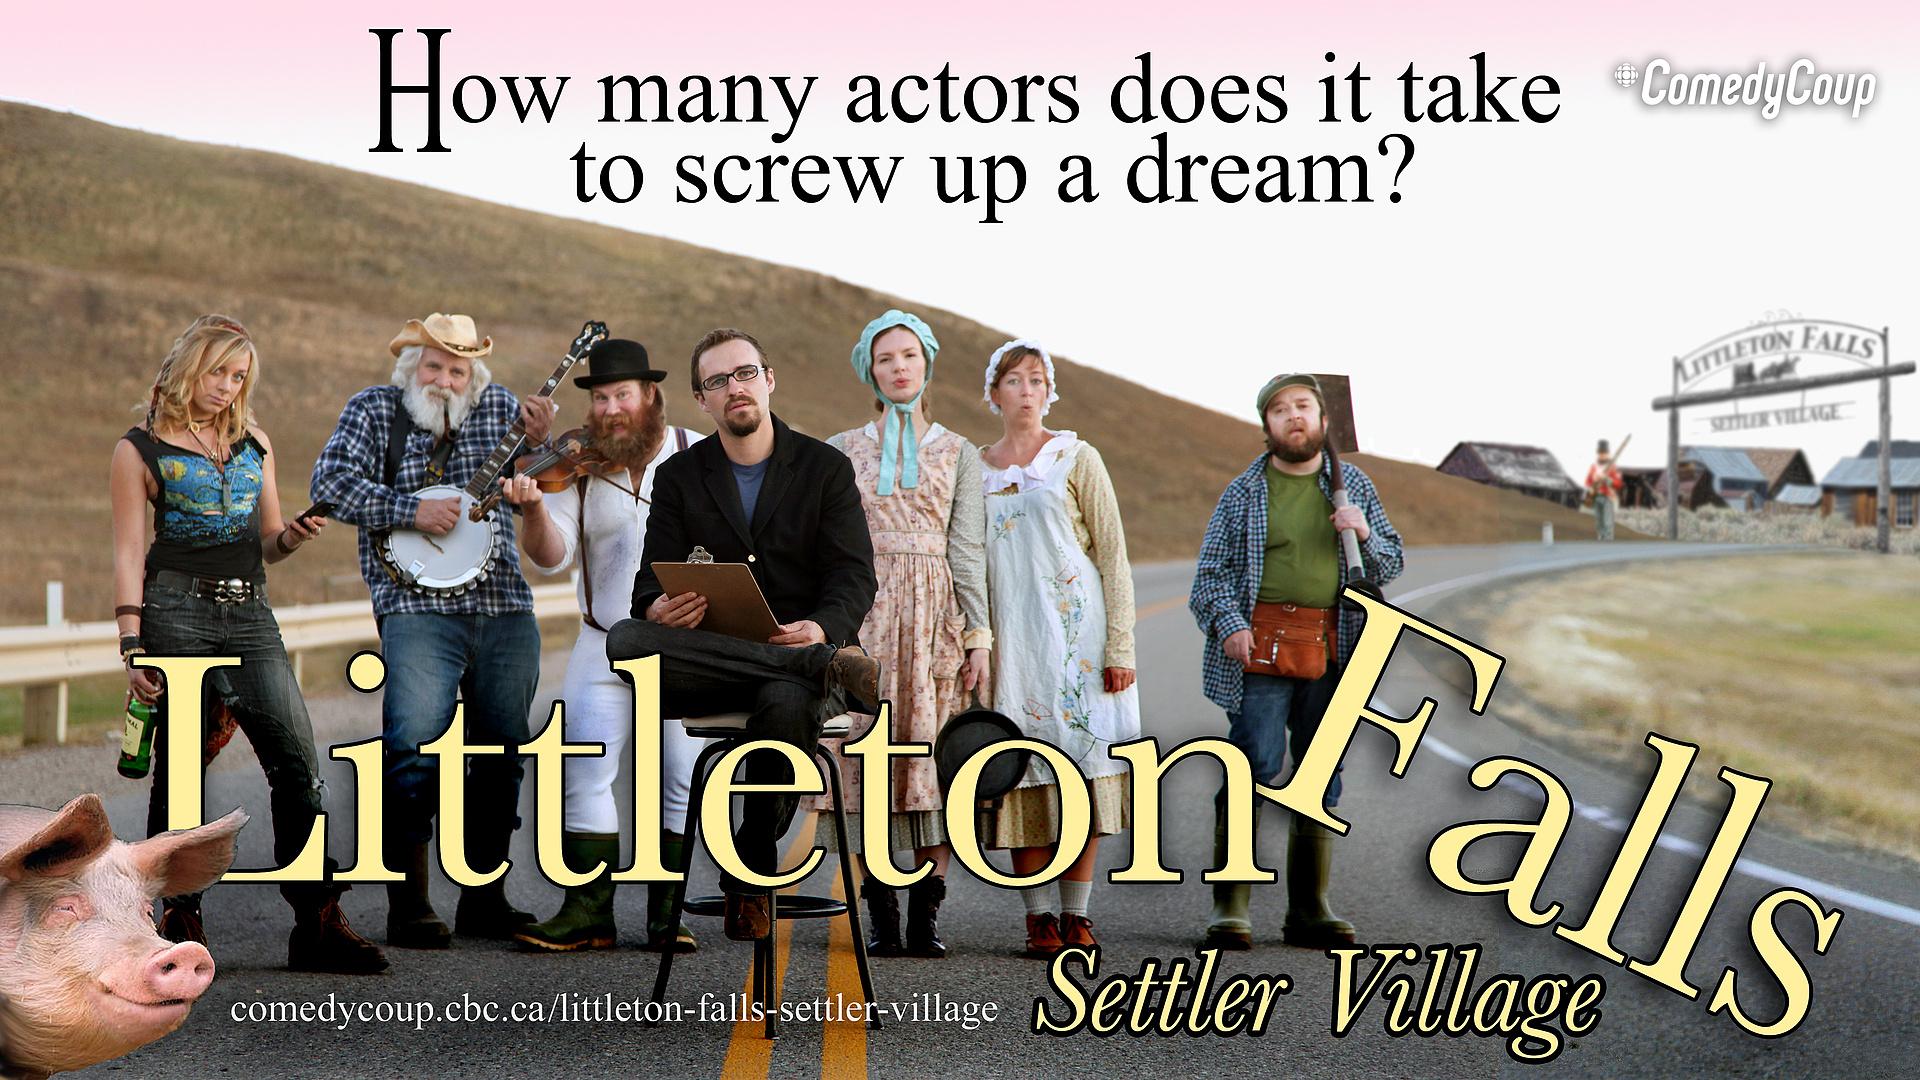 Week 4 Key It: Poster B Littleton Falls Settler Village